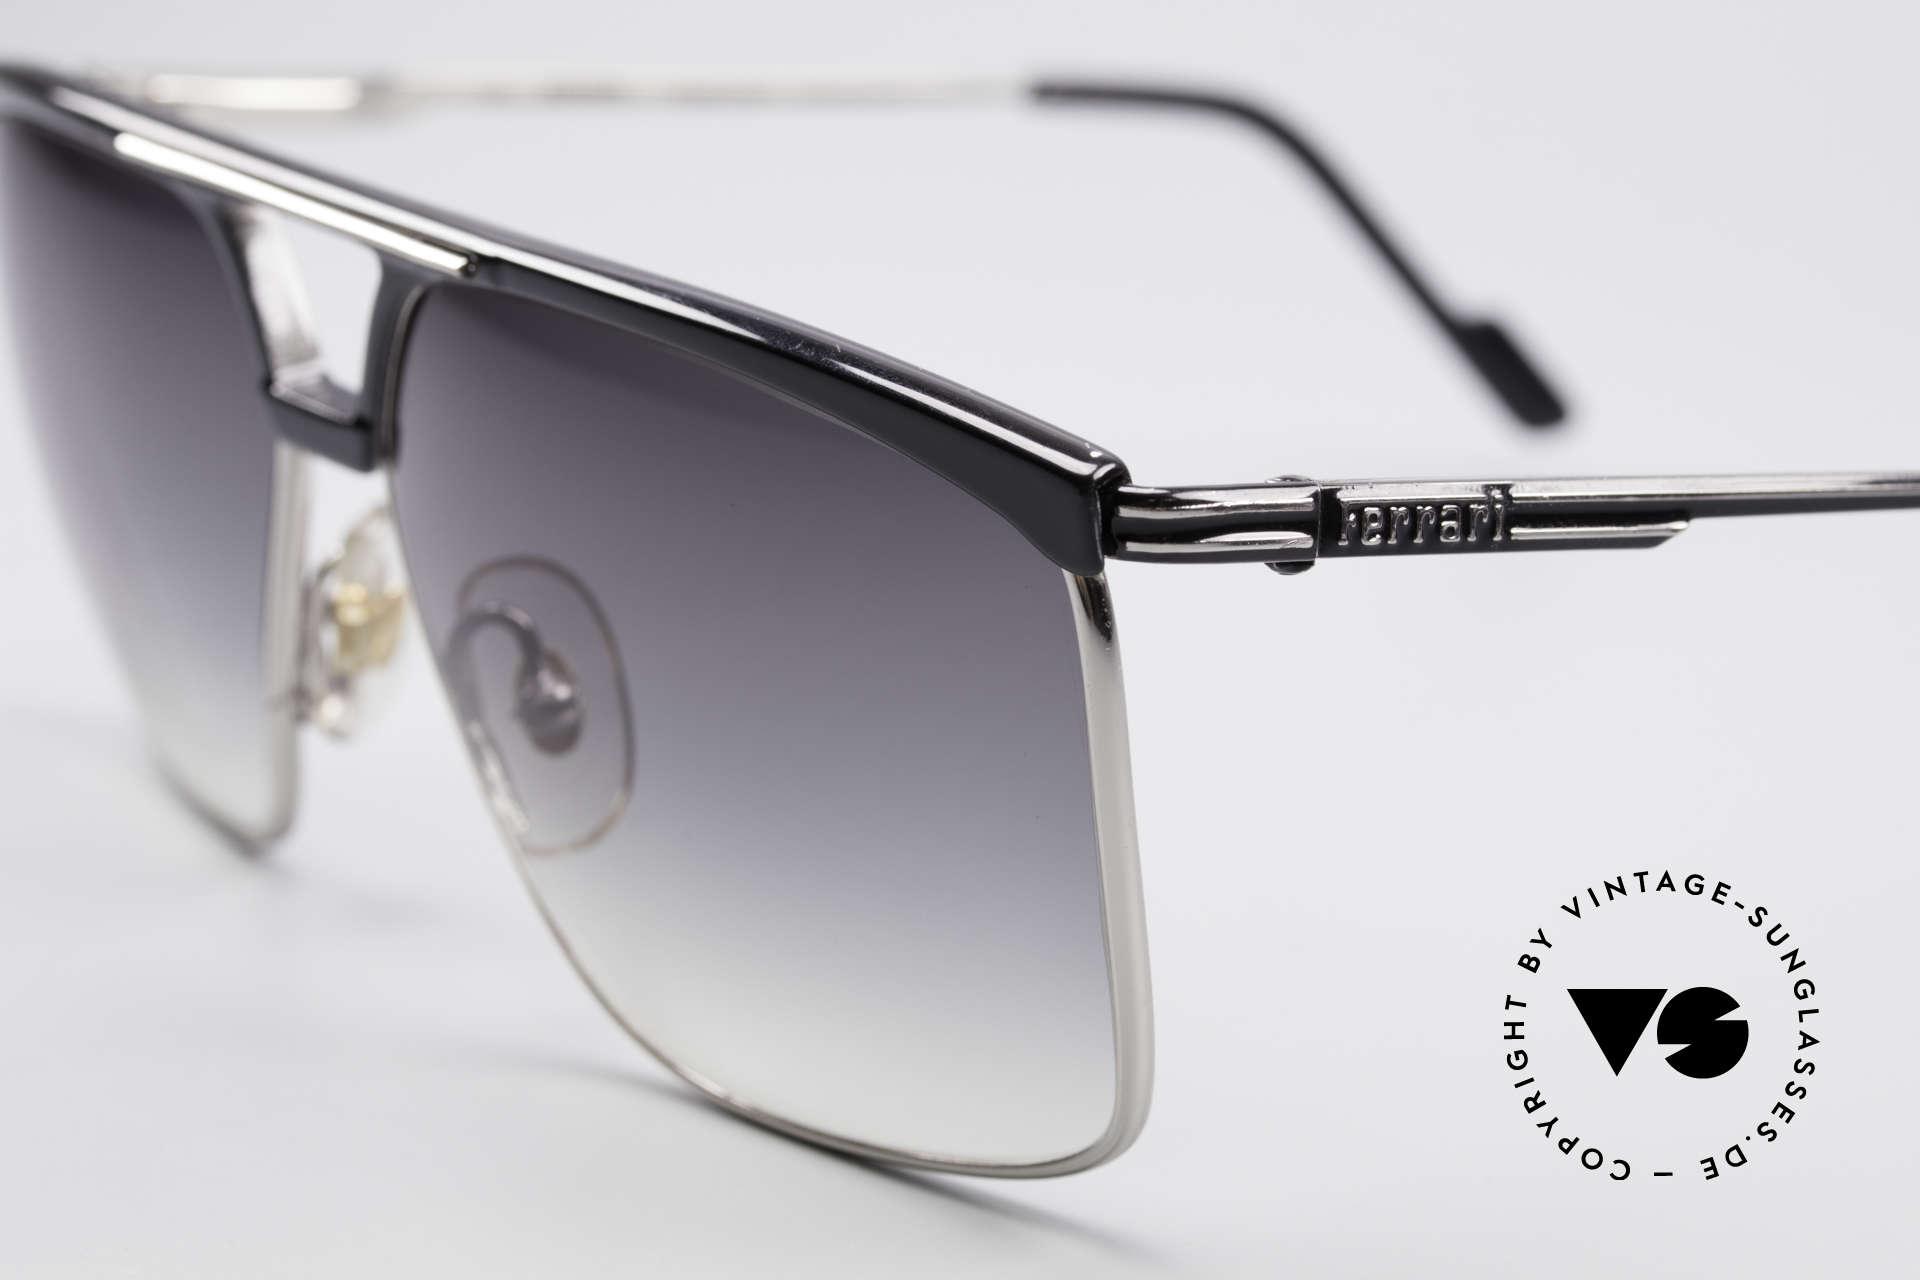 Ferrari F35 Men's 80's Vintage Shades, with gray-gradient sun lenses; 100% UV protection, Made for Men